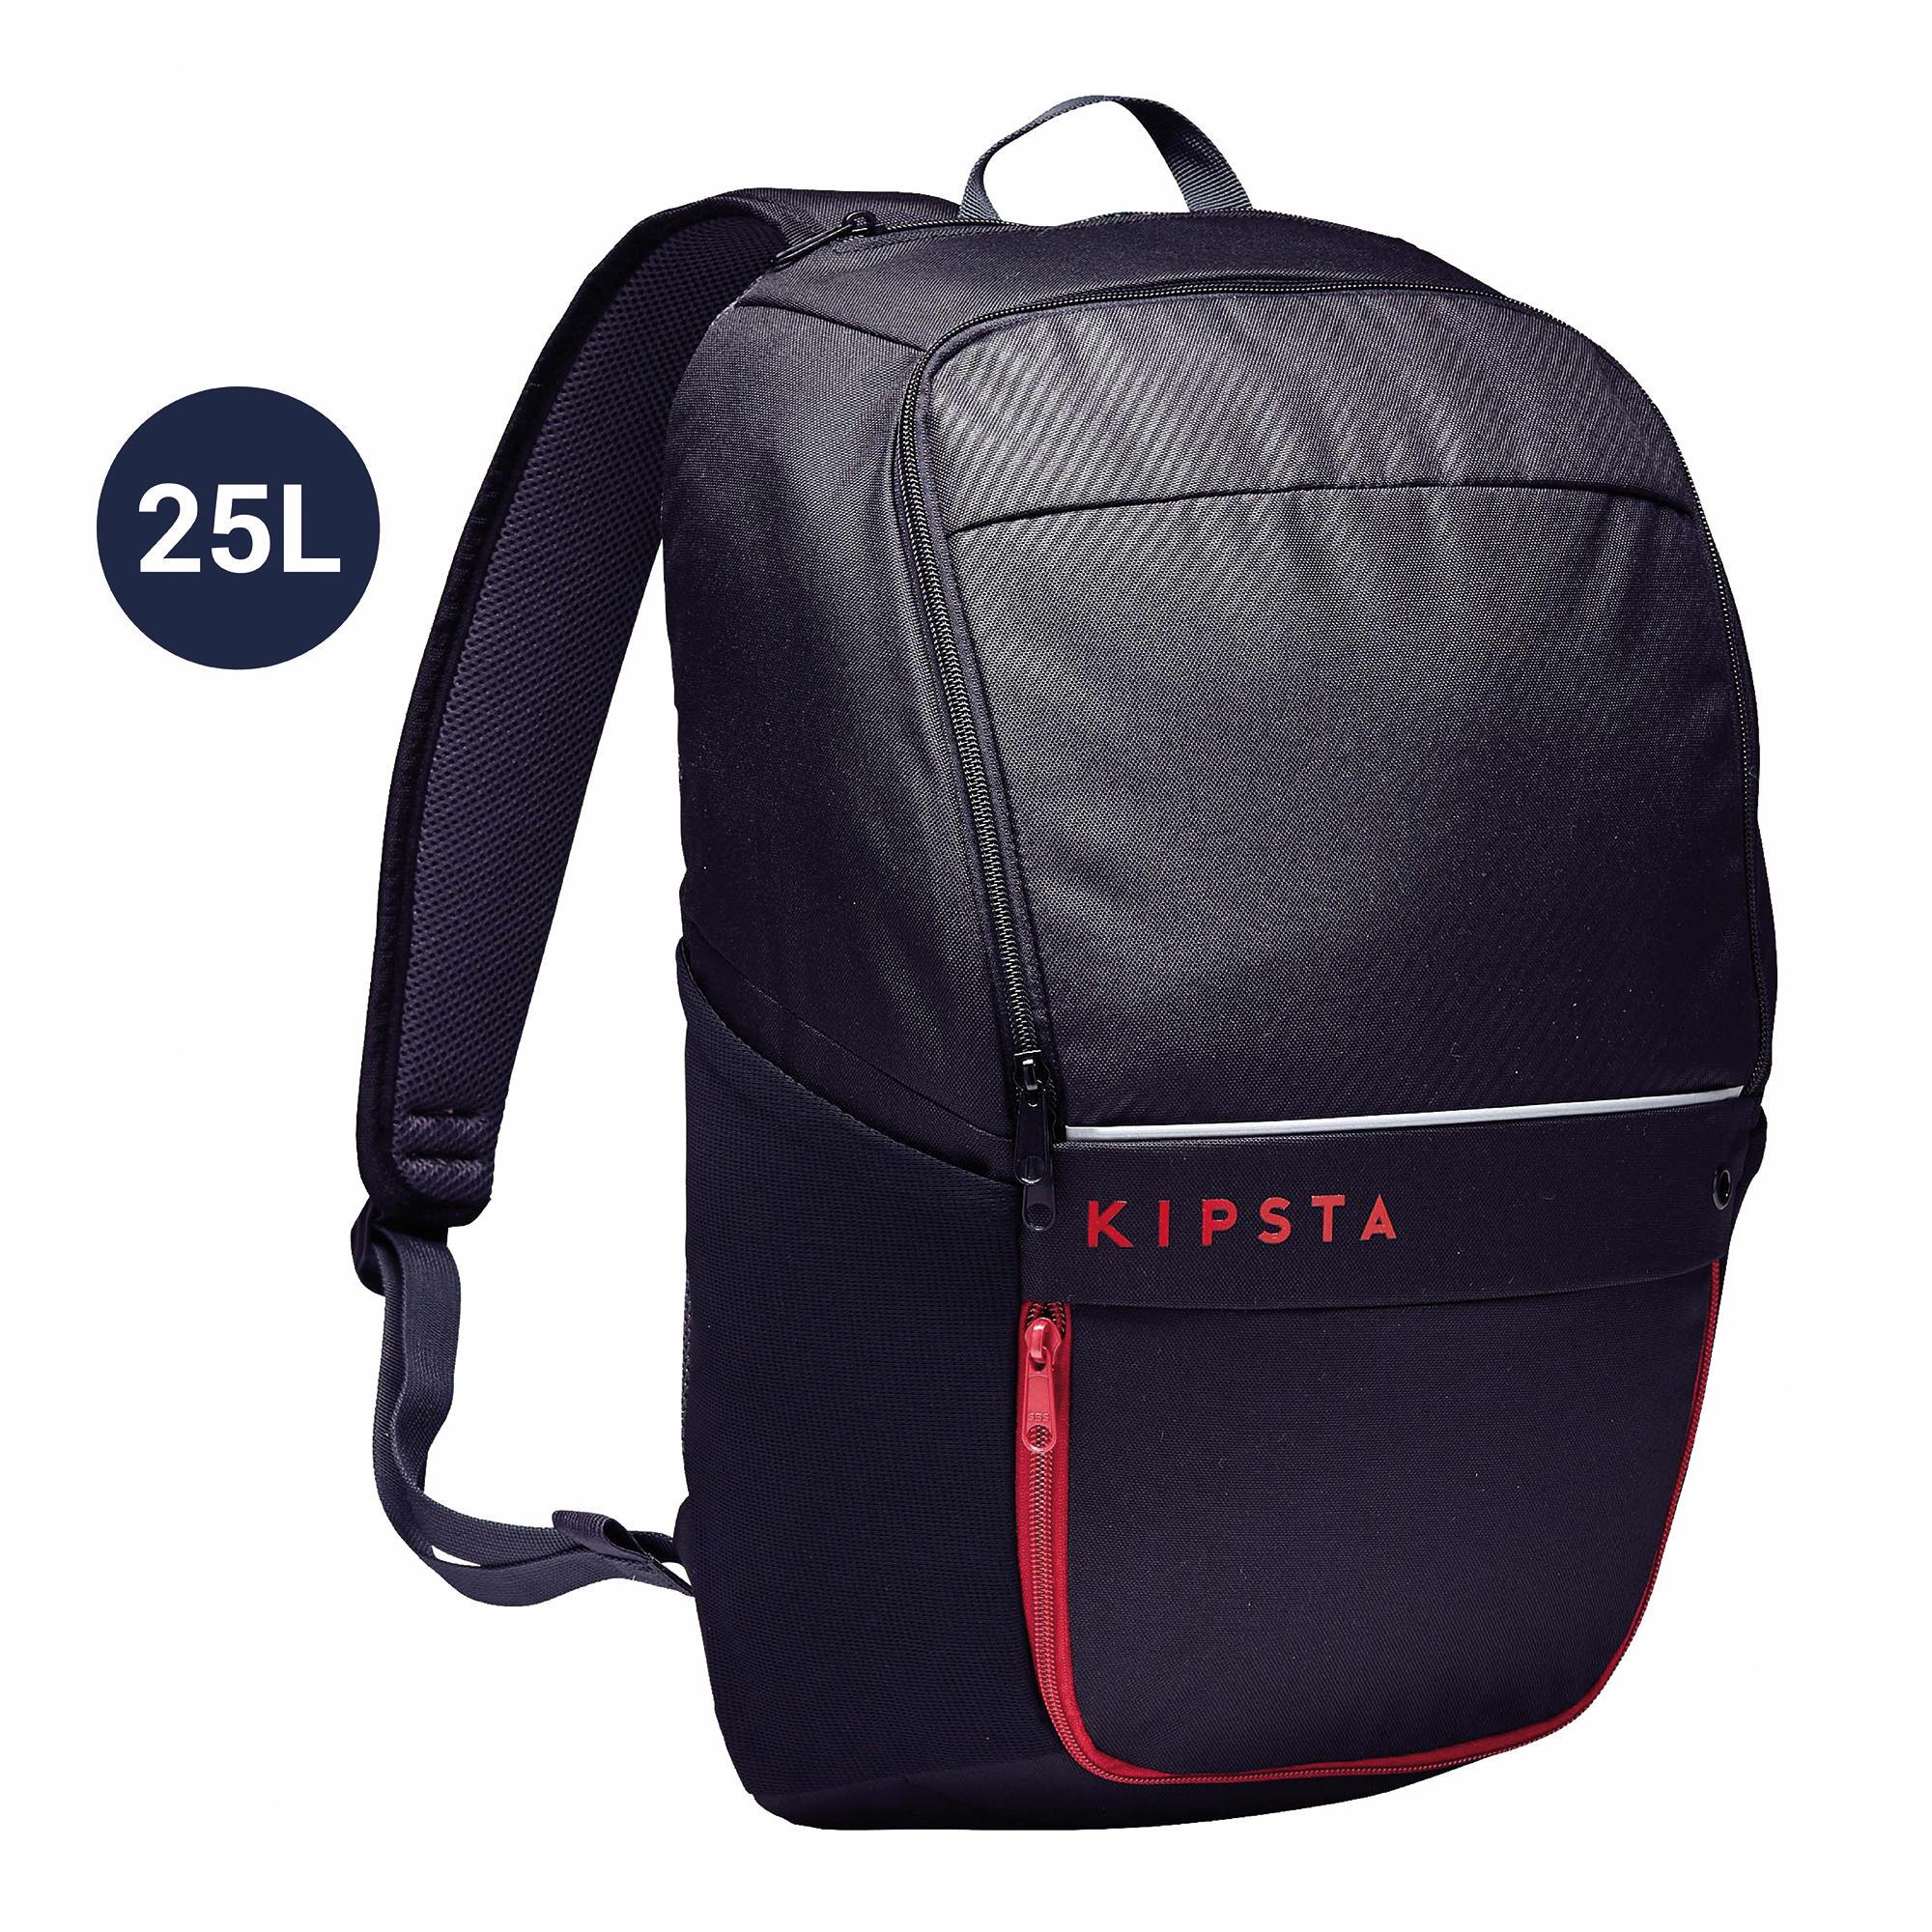 9558257bdf6 Kipsta Rugzak Classic 25 liter zwart | Kopen via Skishop4u.nl